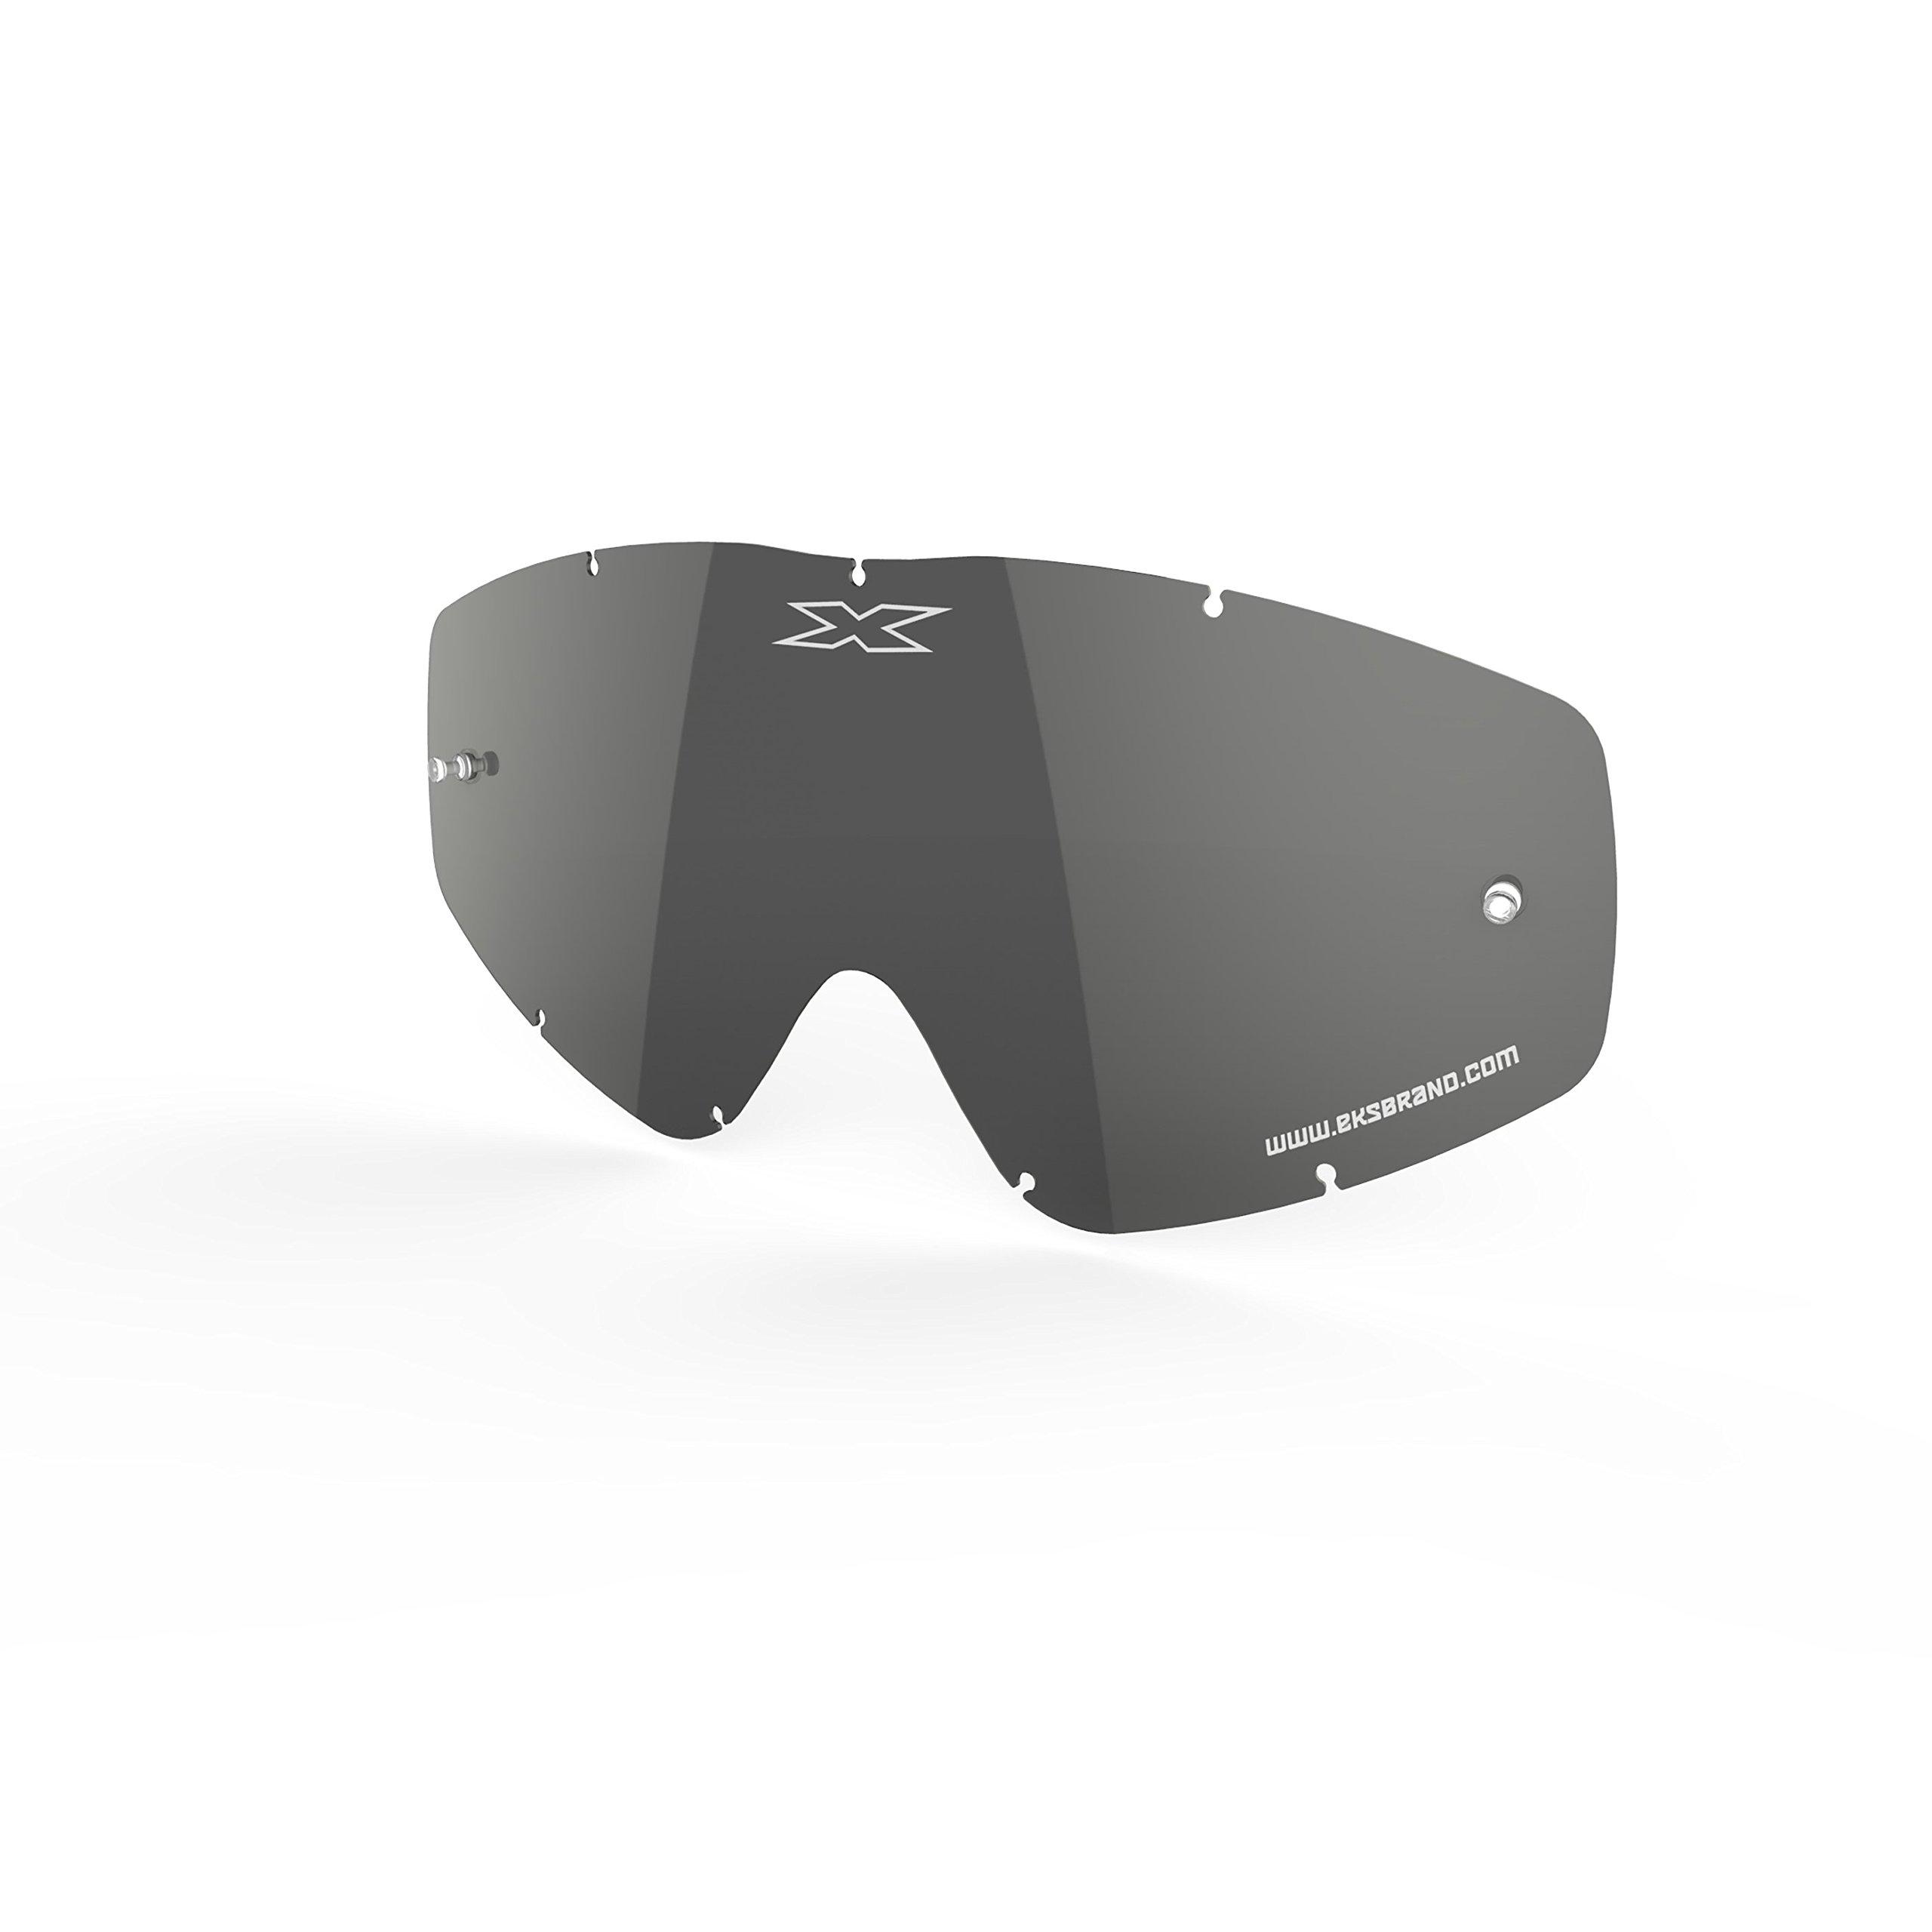 EKS BRAND Unisex-Adult Single Pane GOX MX Motorcross Goggle Replacement Lens (Silver, One Size)